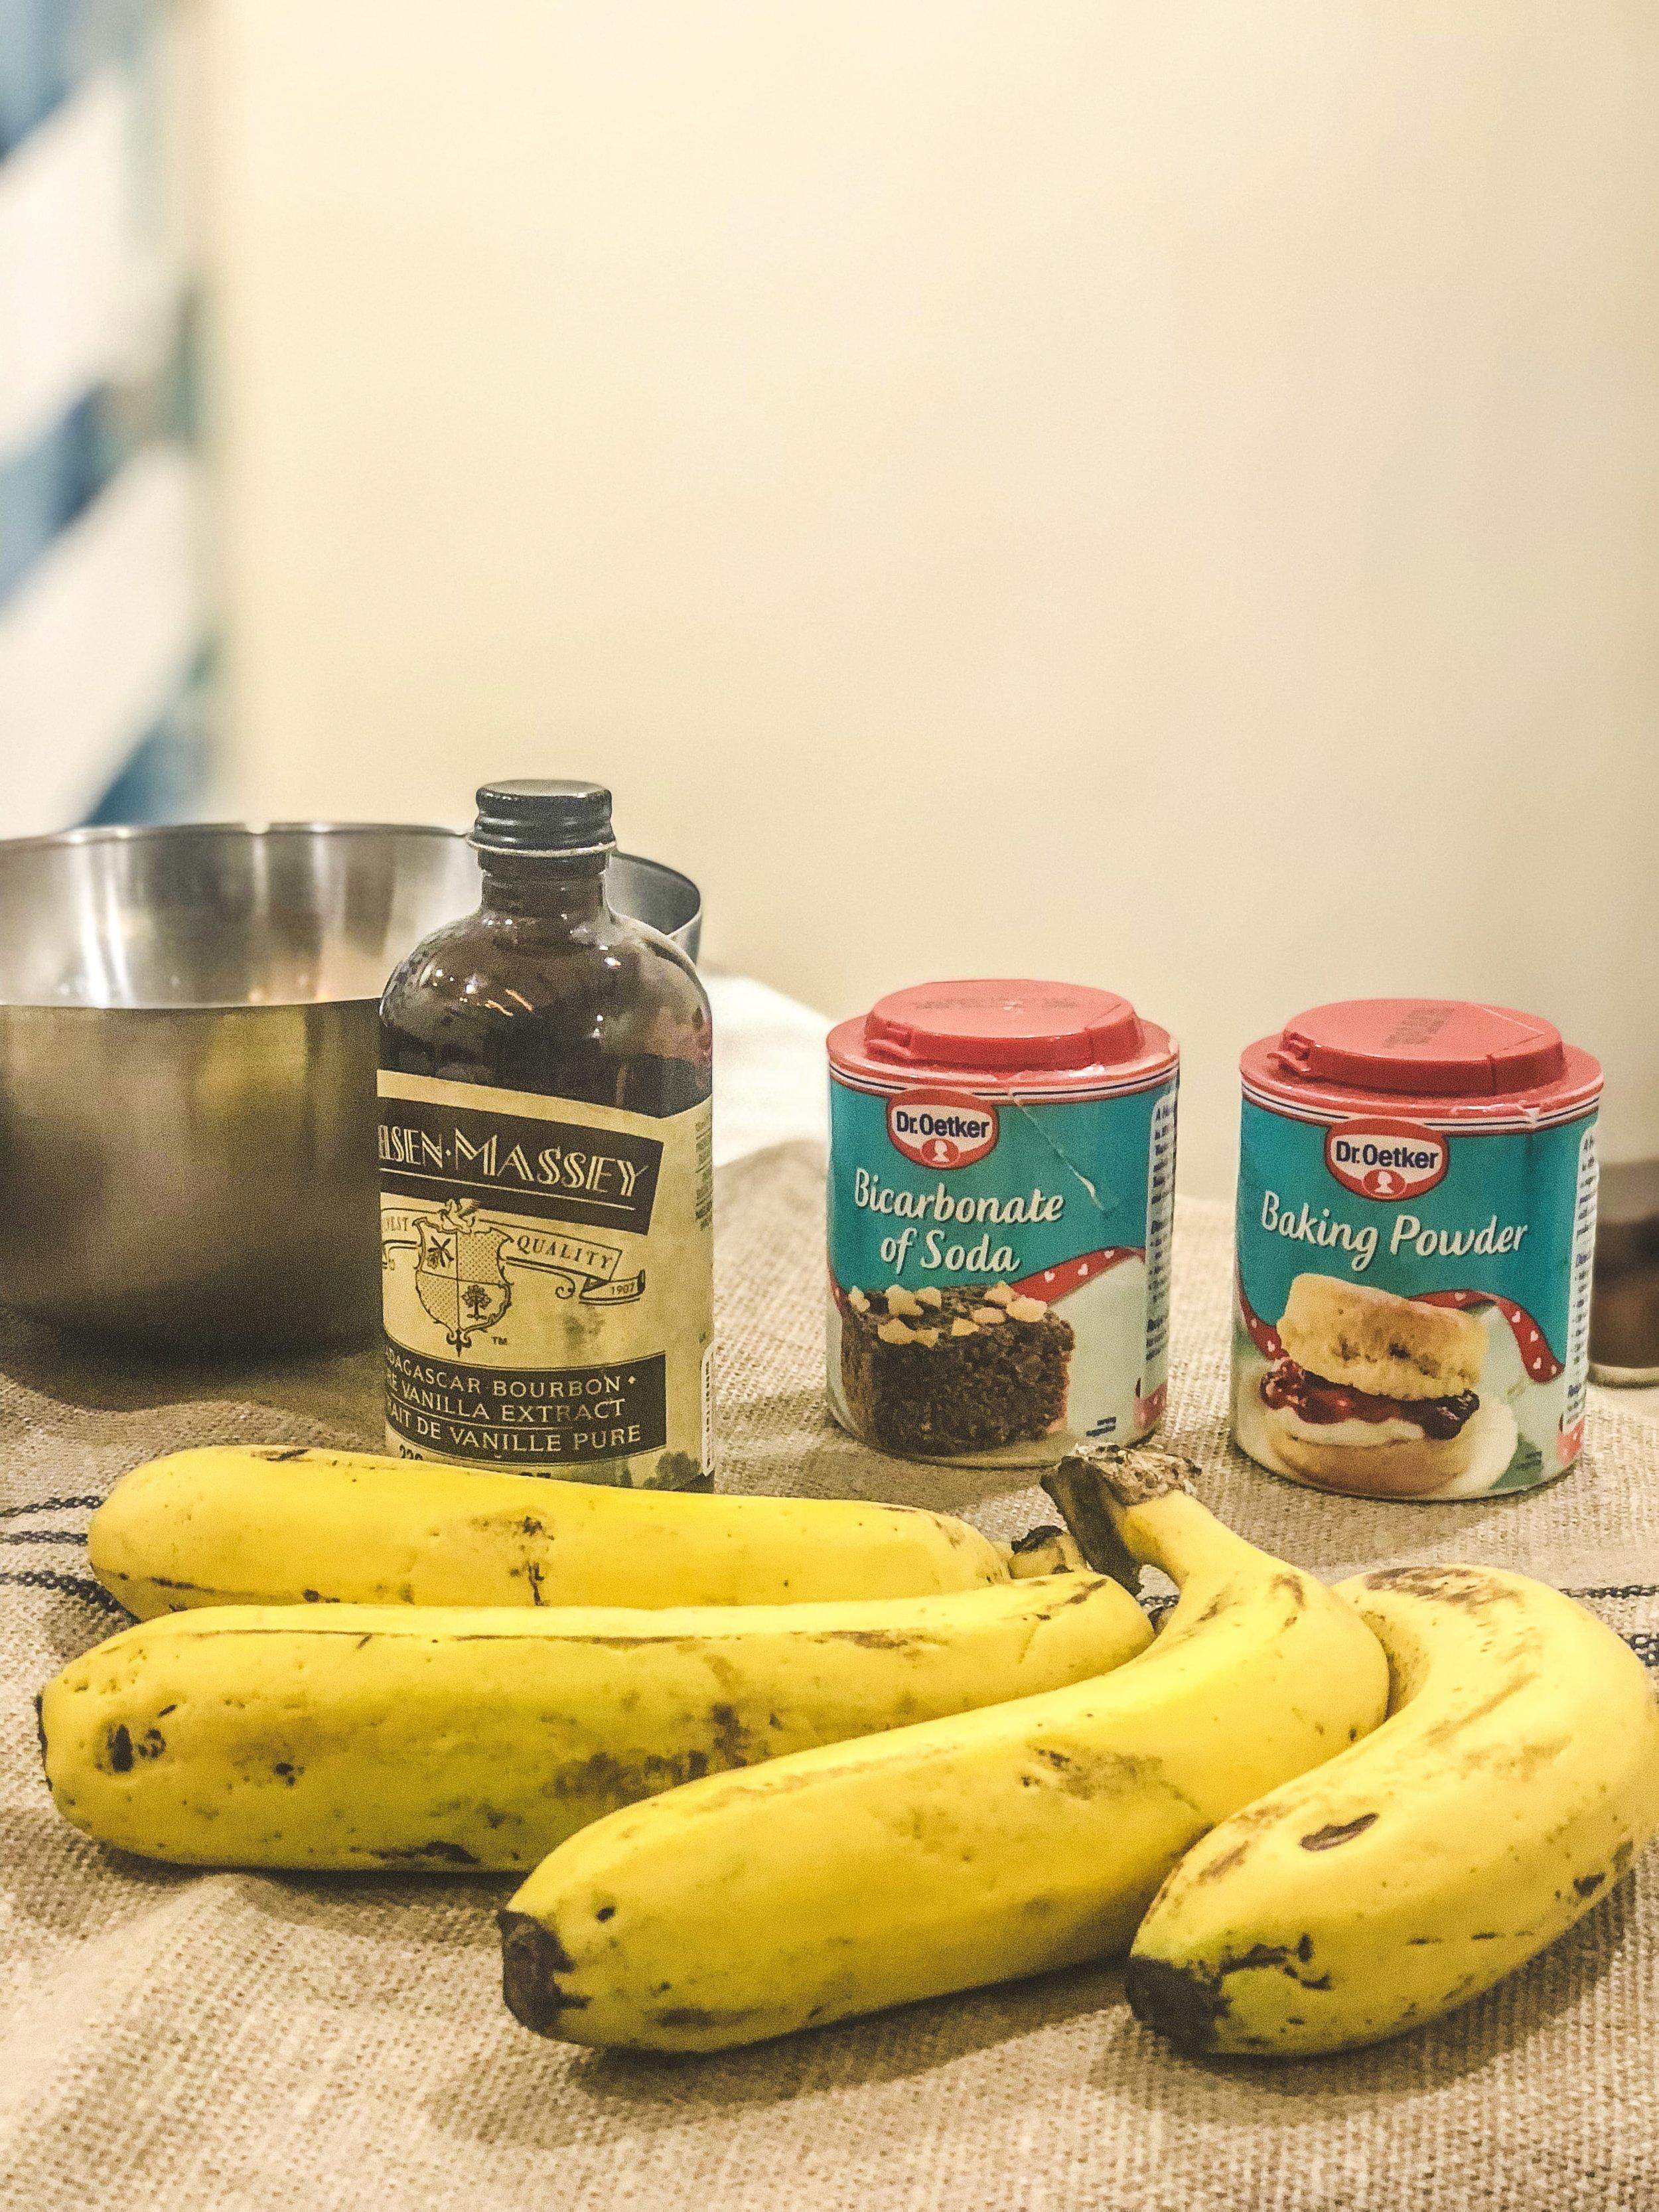 Make sure those bananas are riper than ripe